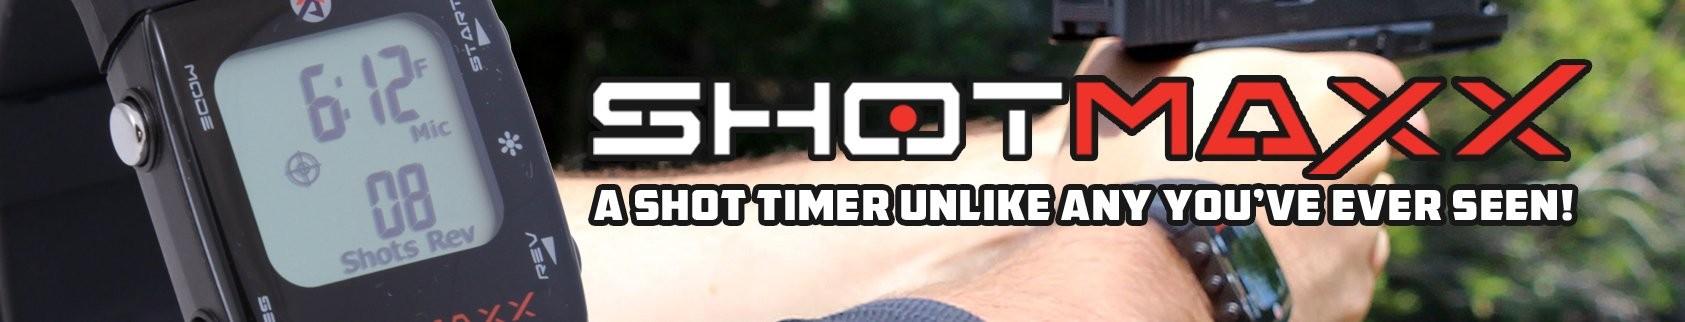 Shotmaxx